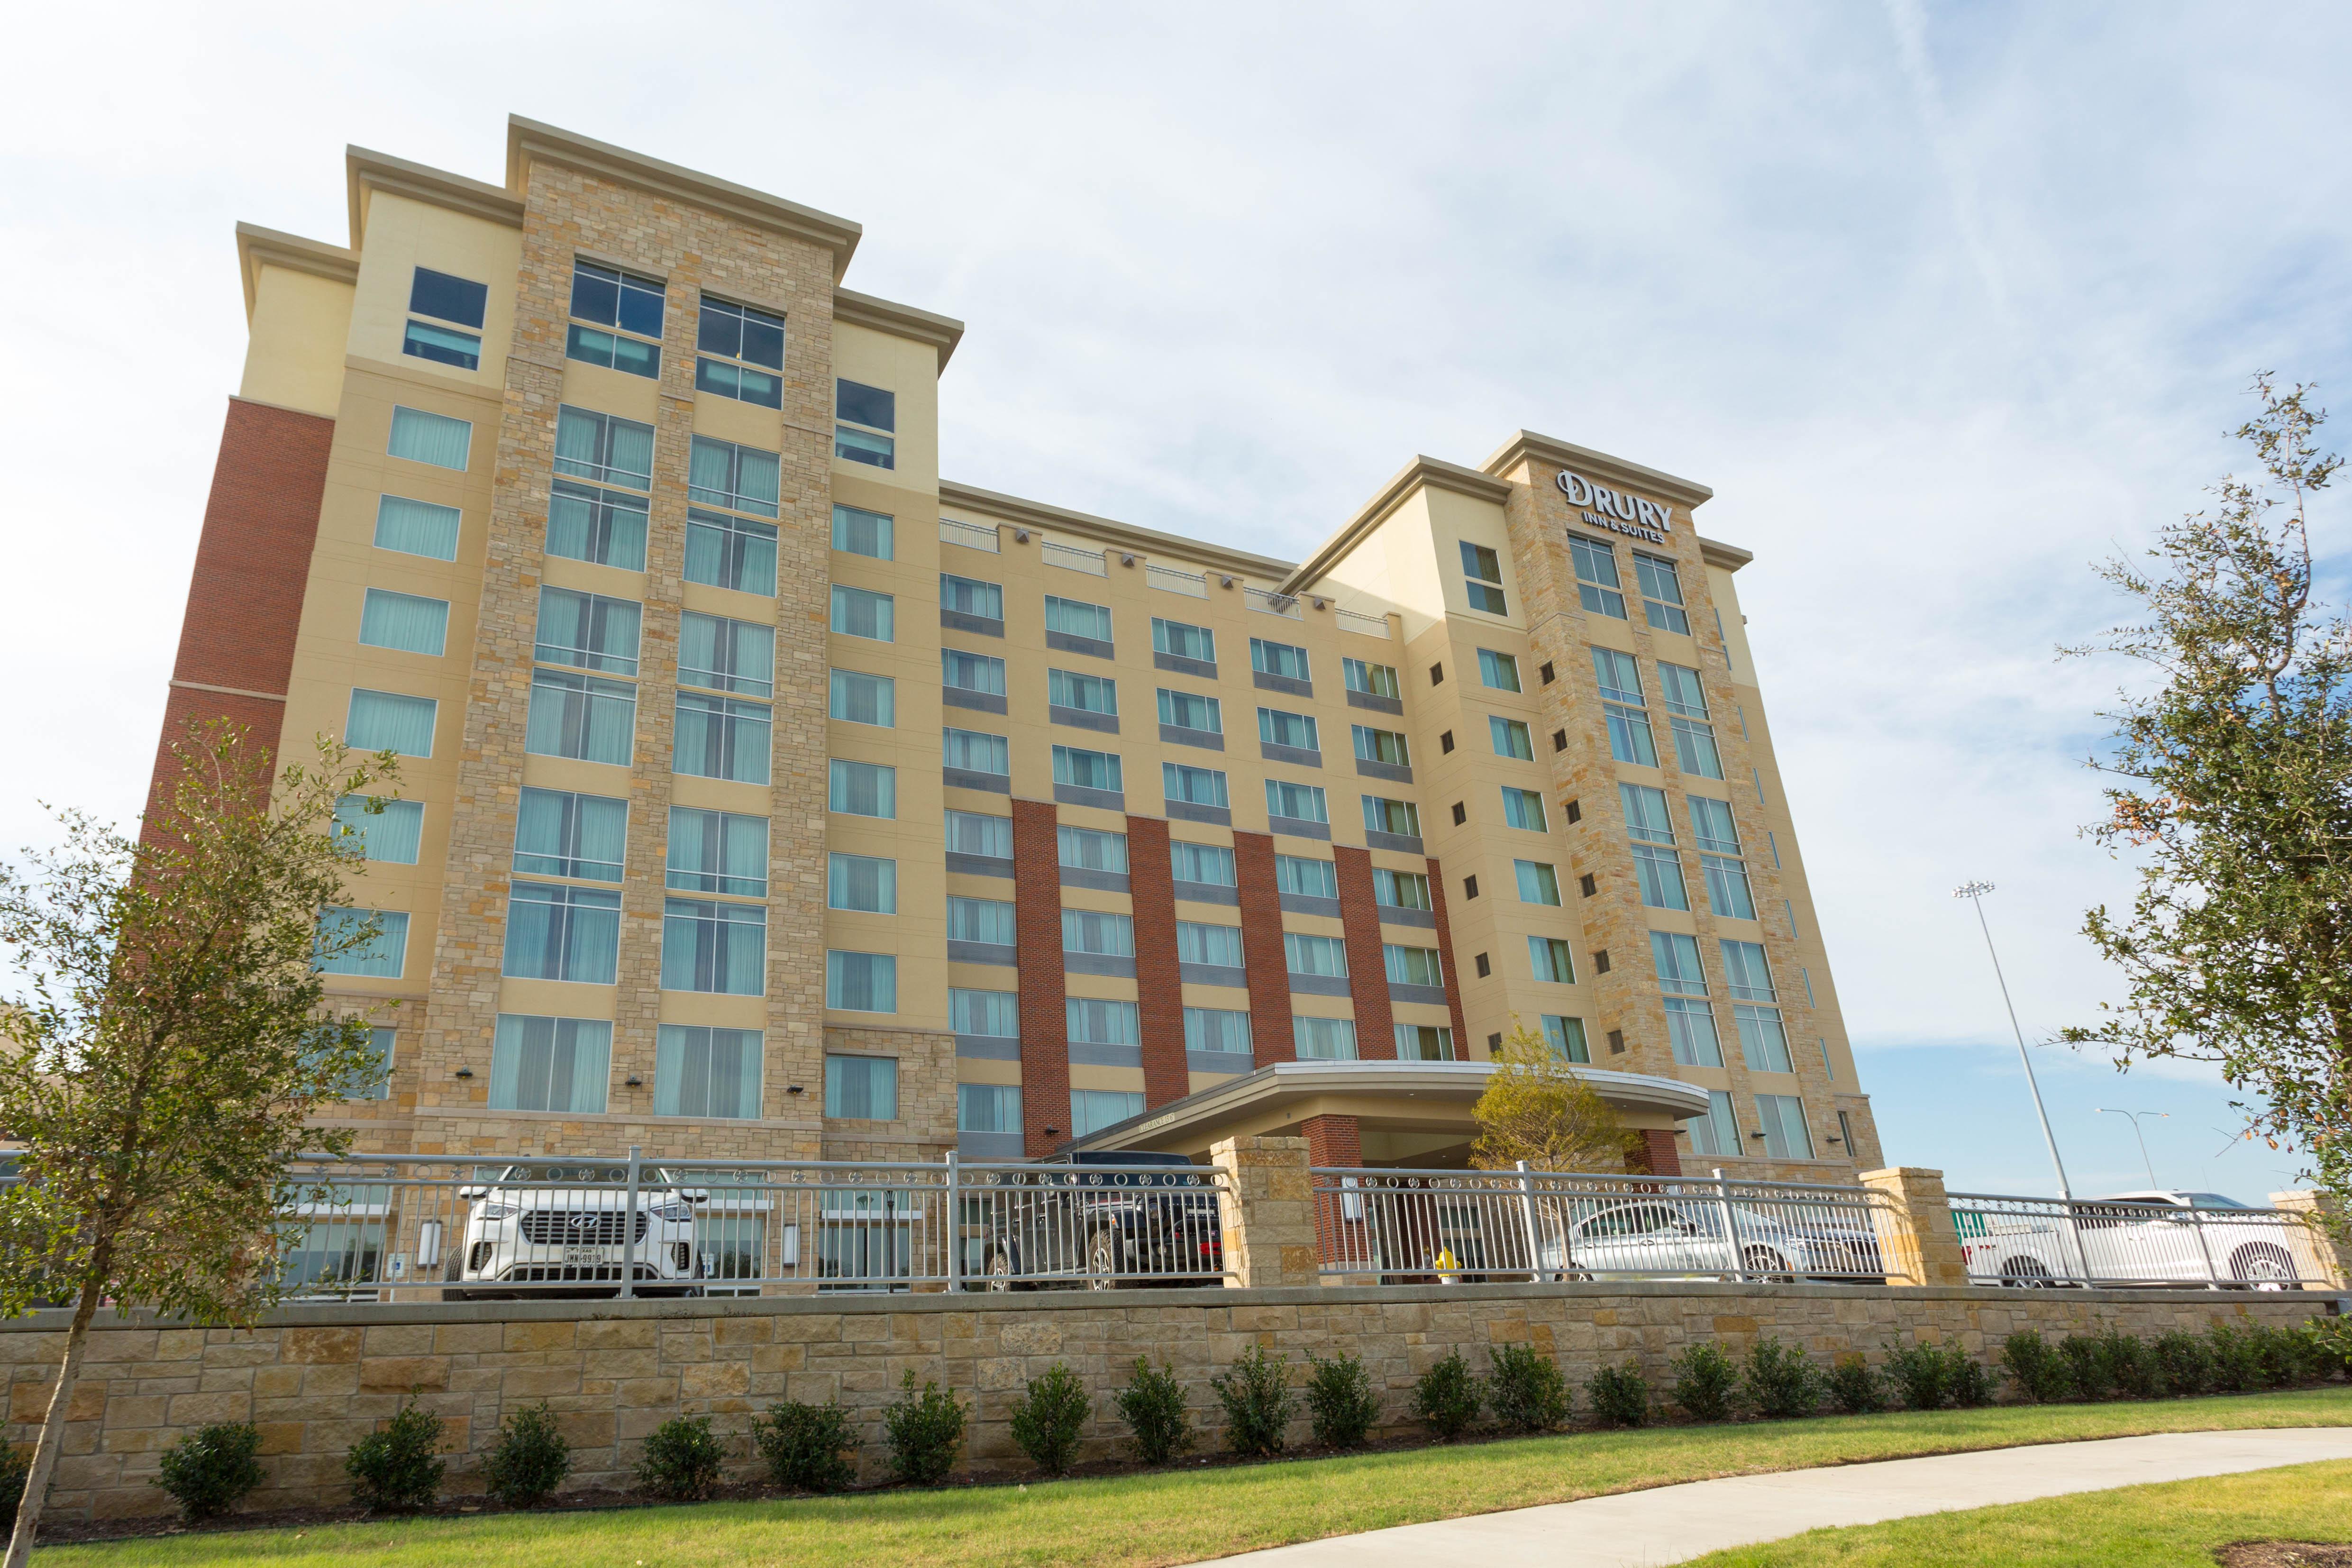 Drury Inn Suites Dallas Frisco Drury Hotels